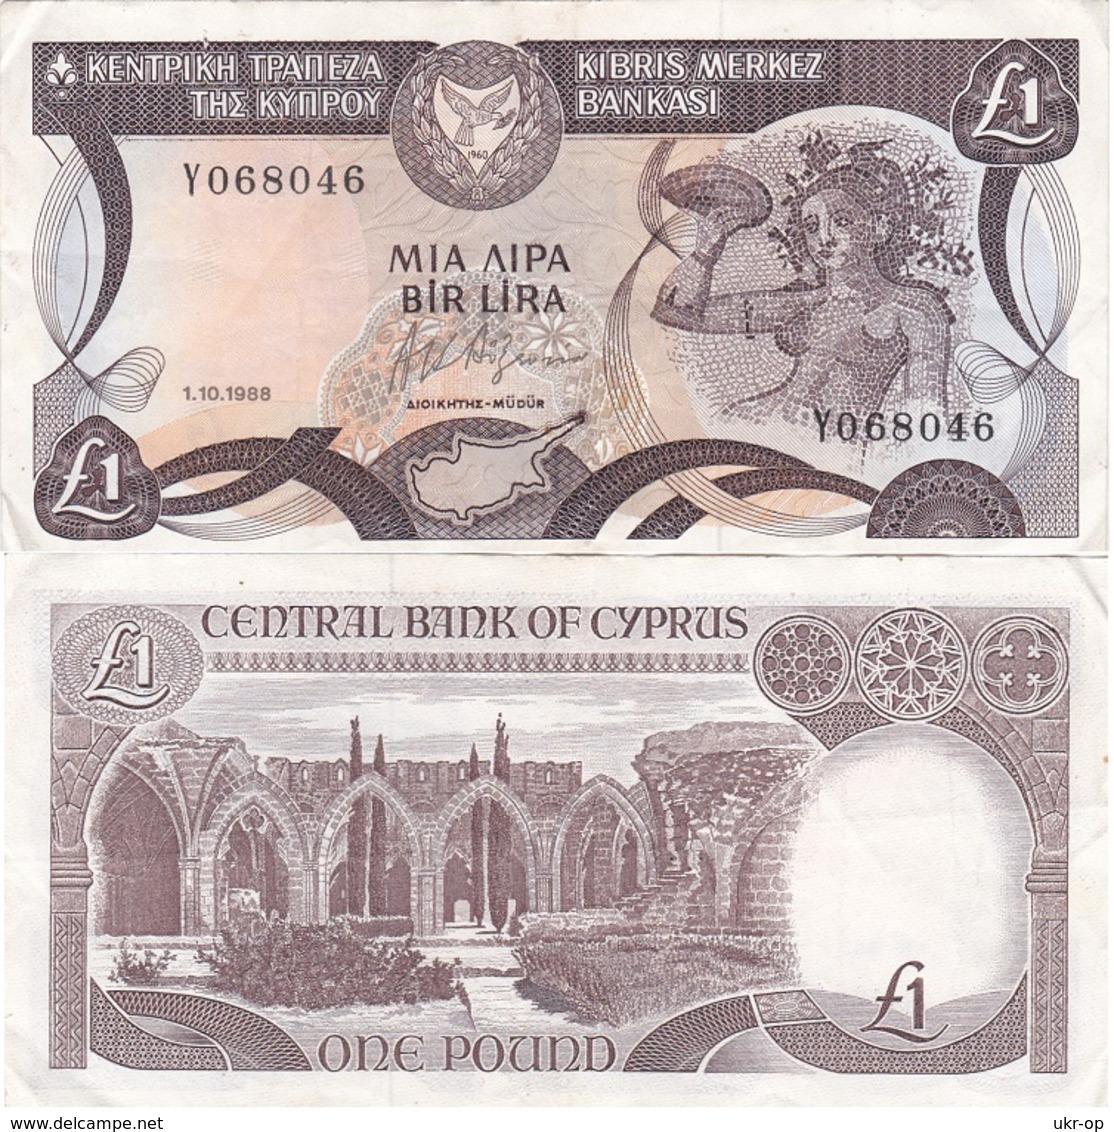 Cyprus - 1 Pound 01.10. 1988 VF Ukr-OP - Cyprus